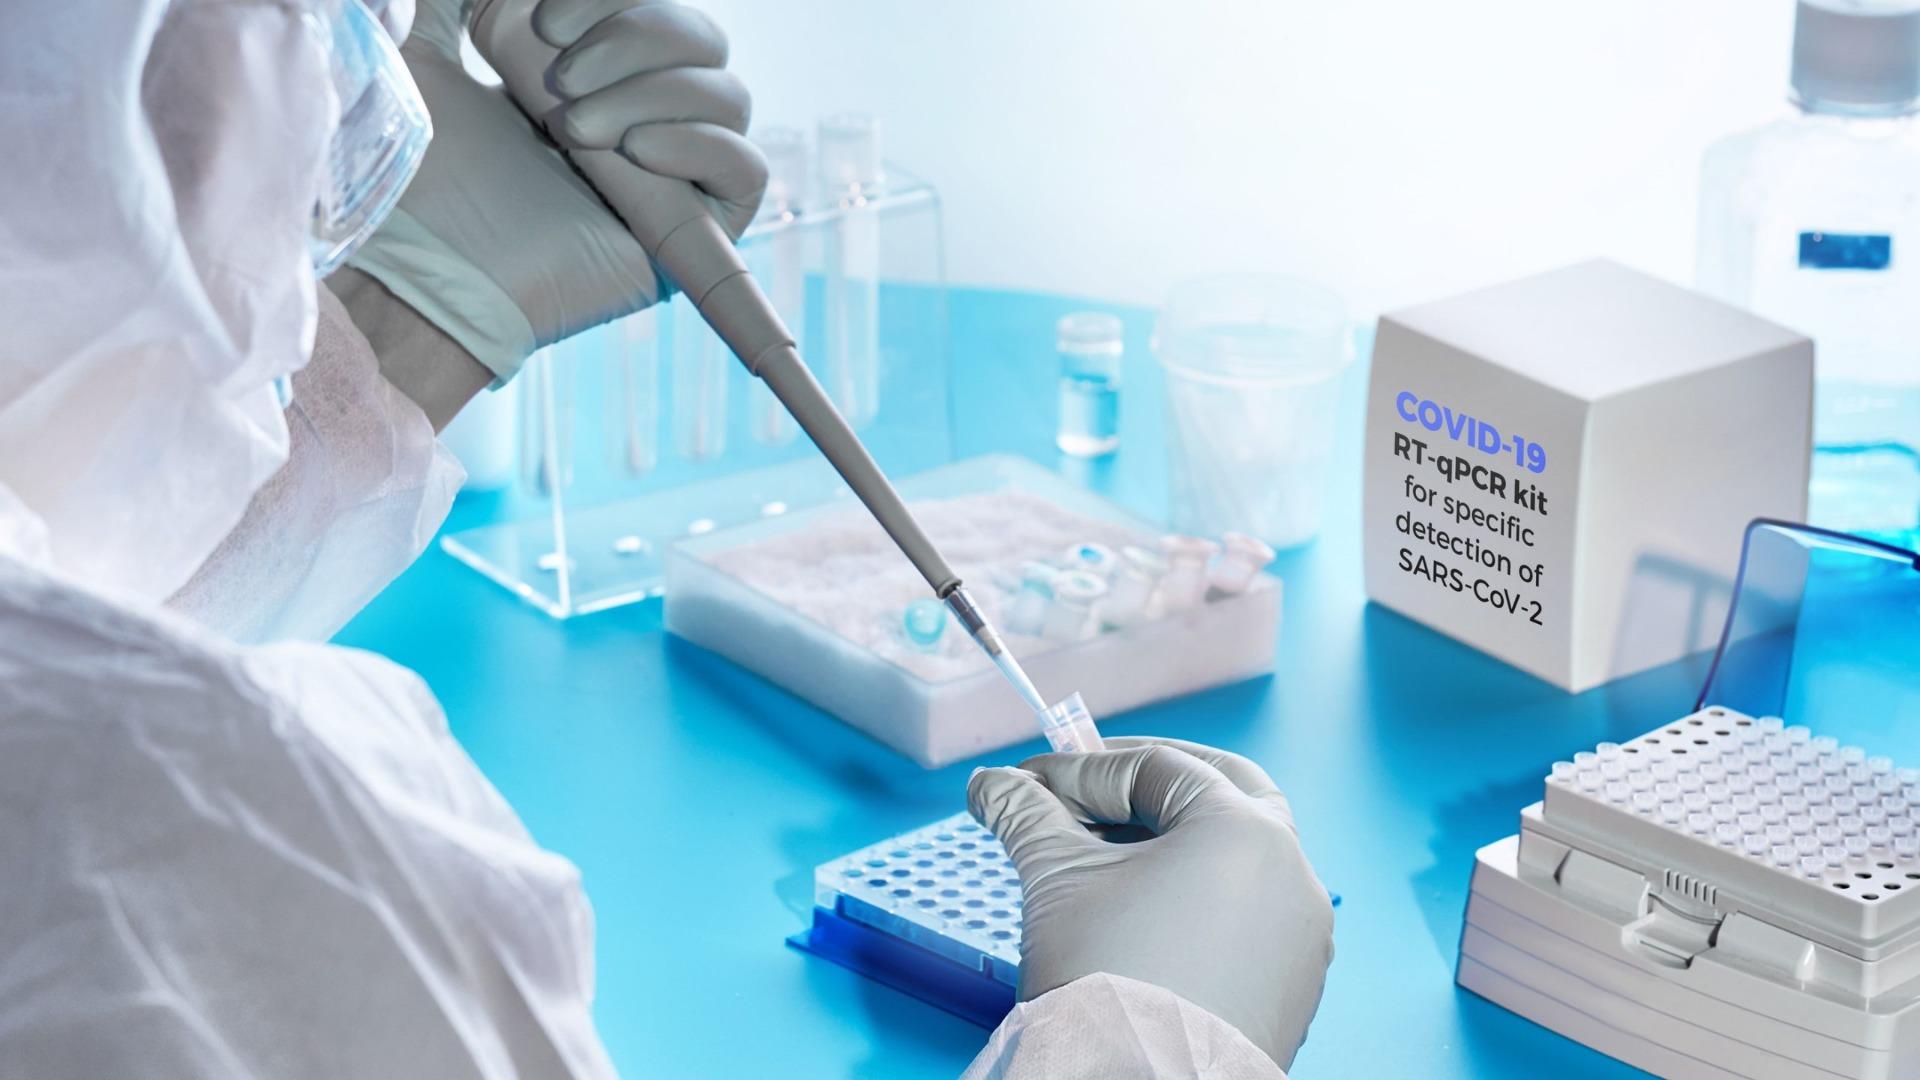 COVID-19 PCR Kits